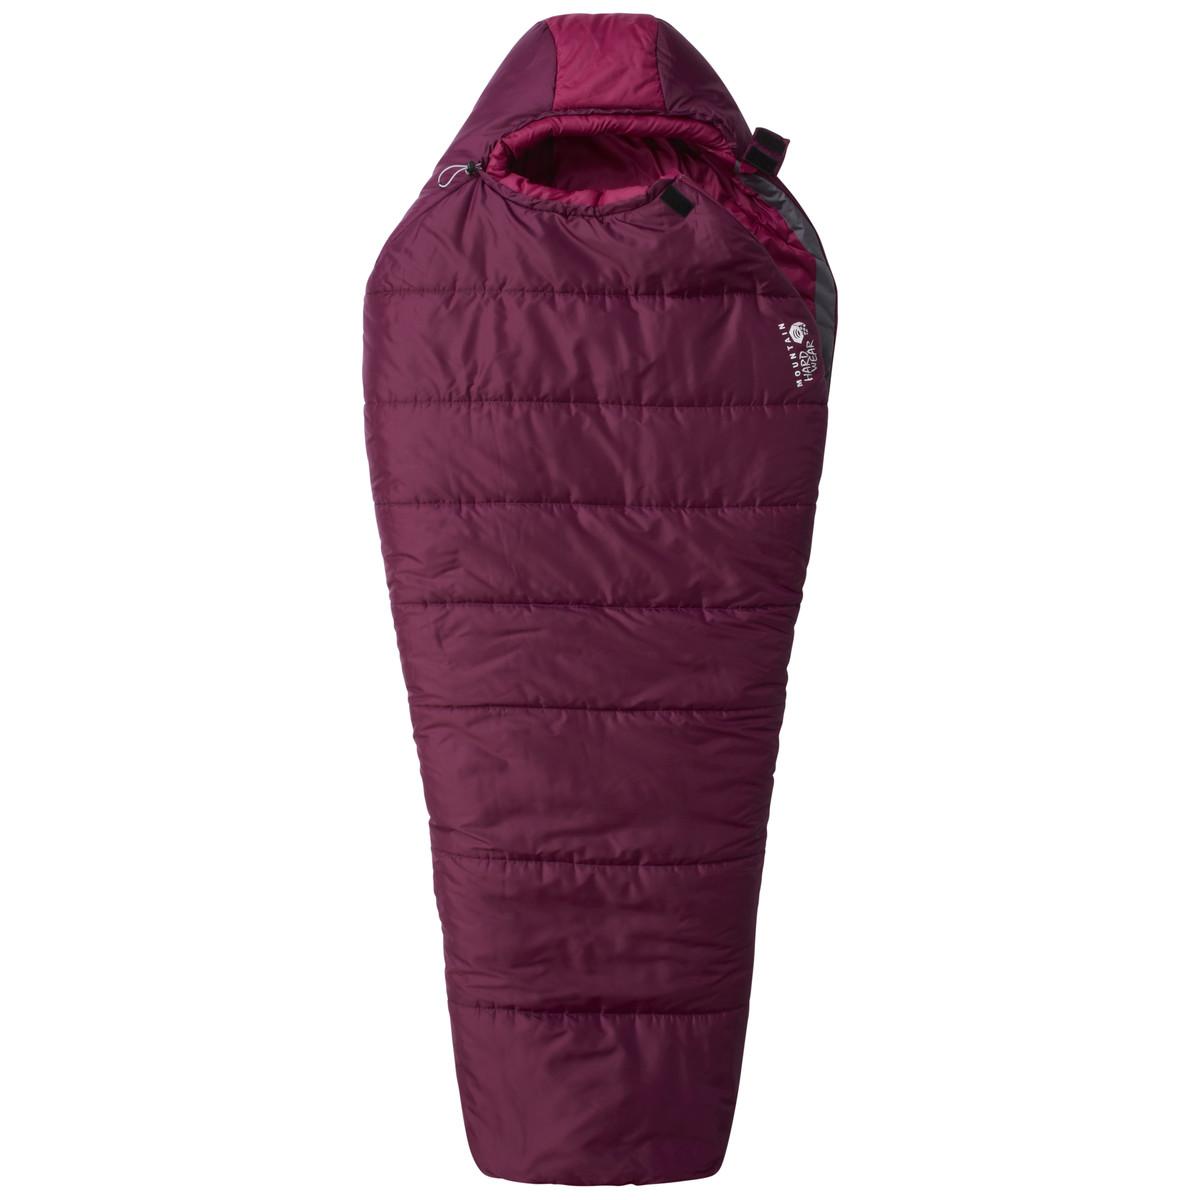 photo: Mountain Hardwear Women's Bozeman Torch 0 3-season synthetic sleeping bag